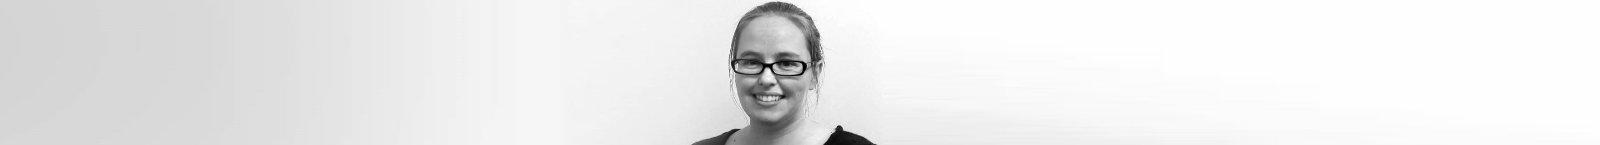 Team member Rebecca Ballantyne